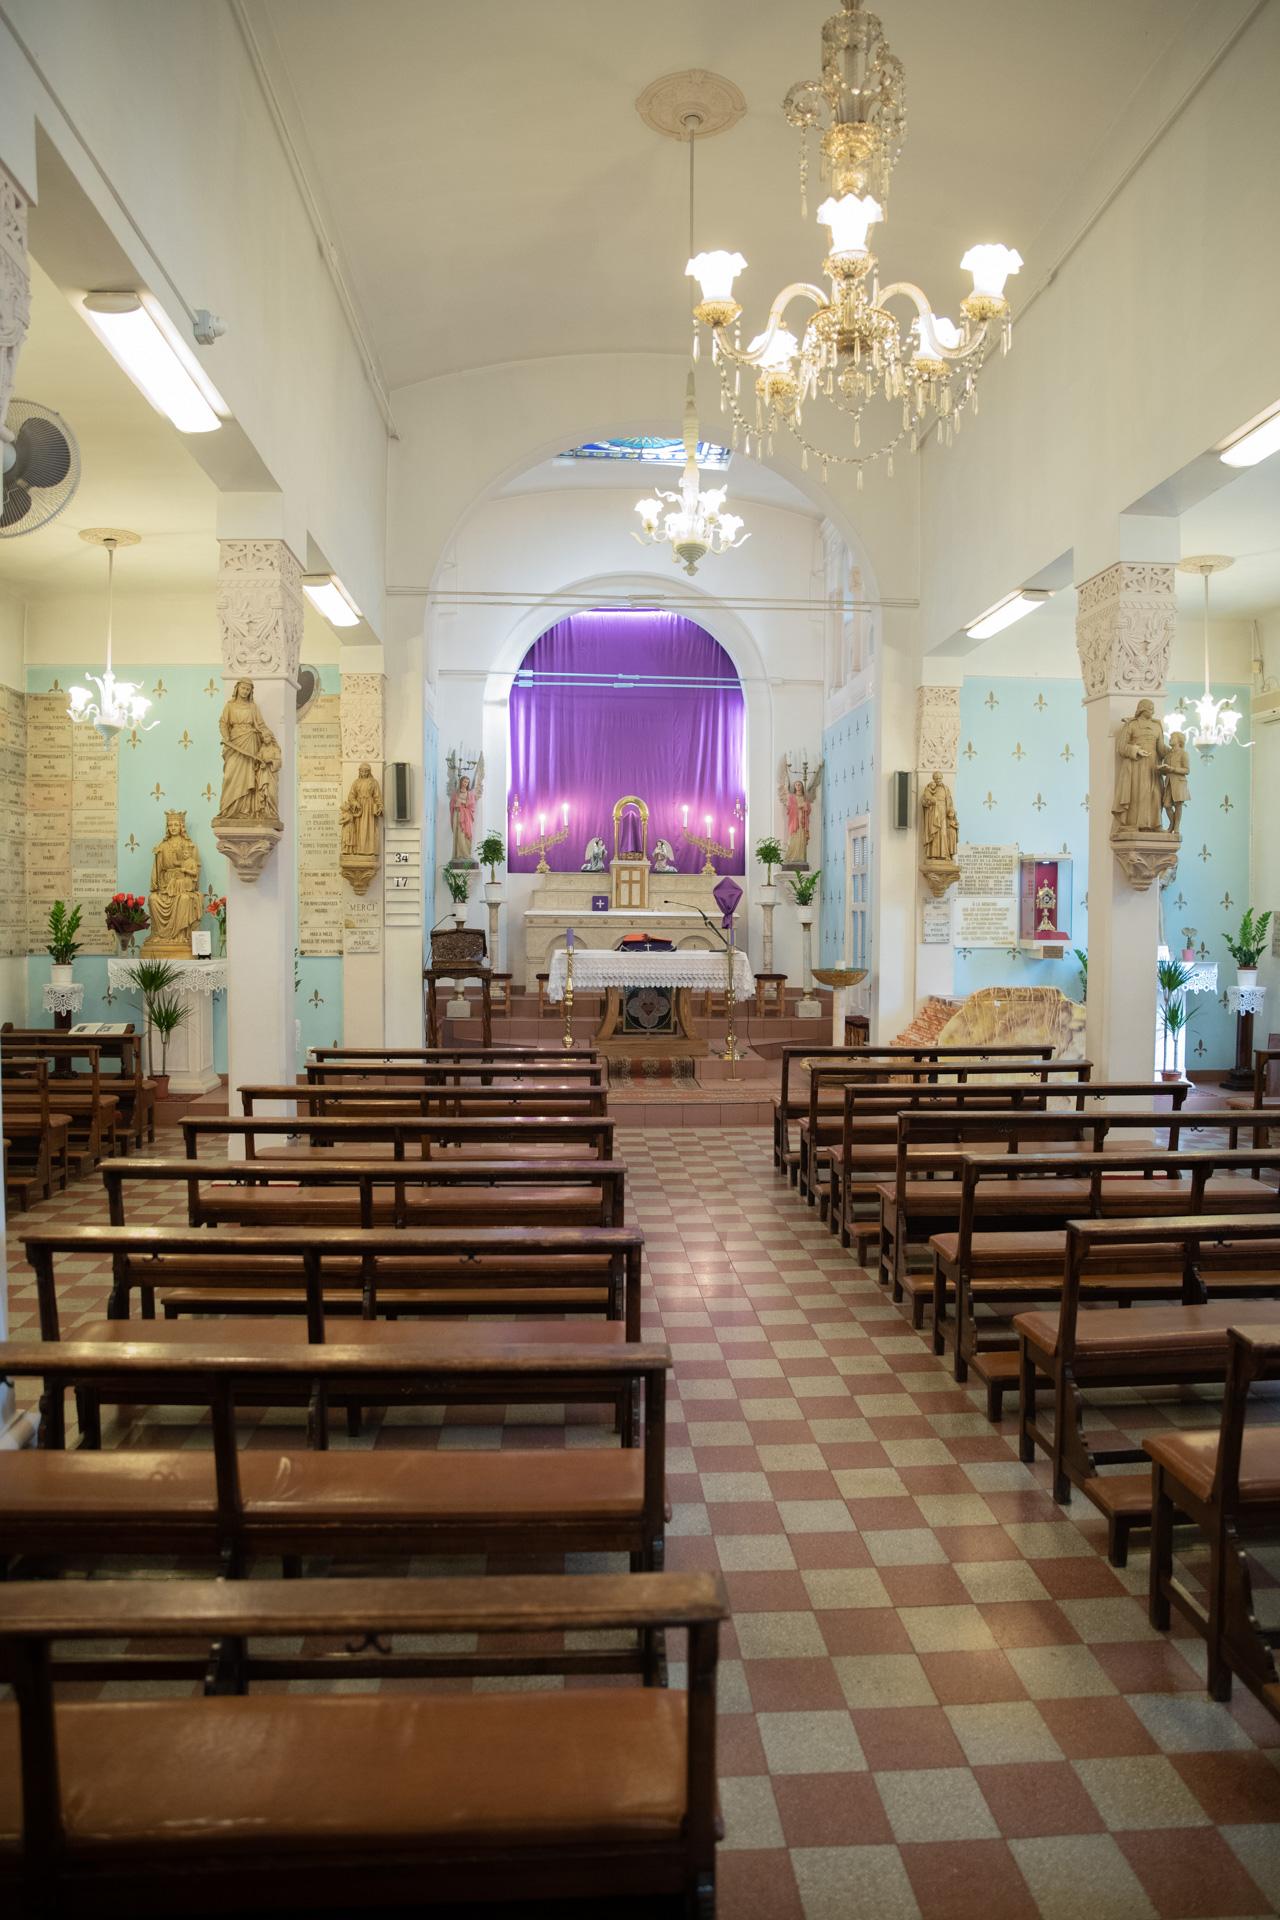 Biserica Unde A Slujit Fericitul Vladimir Ghika Biserica